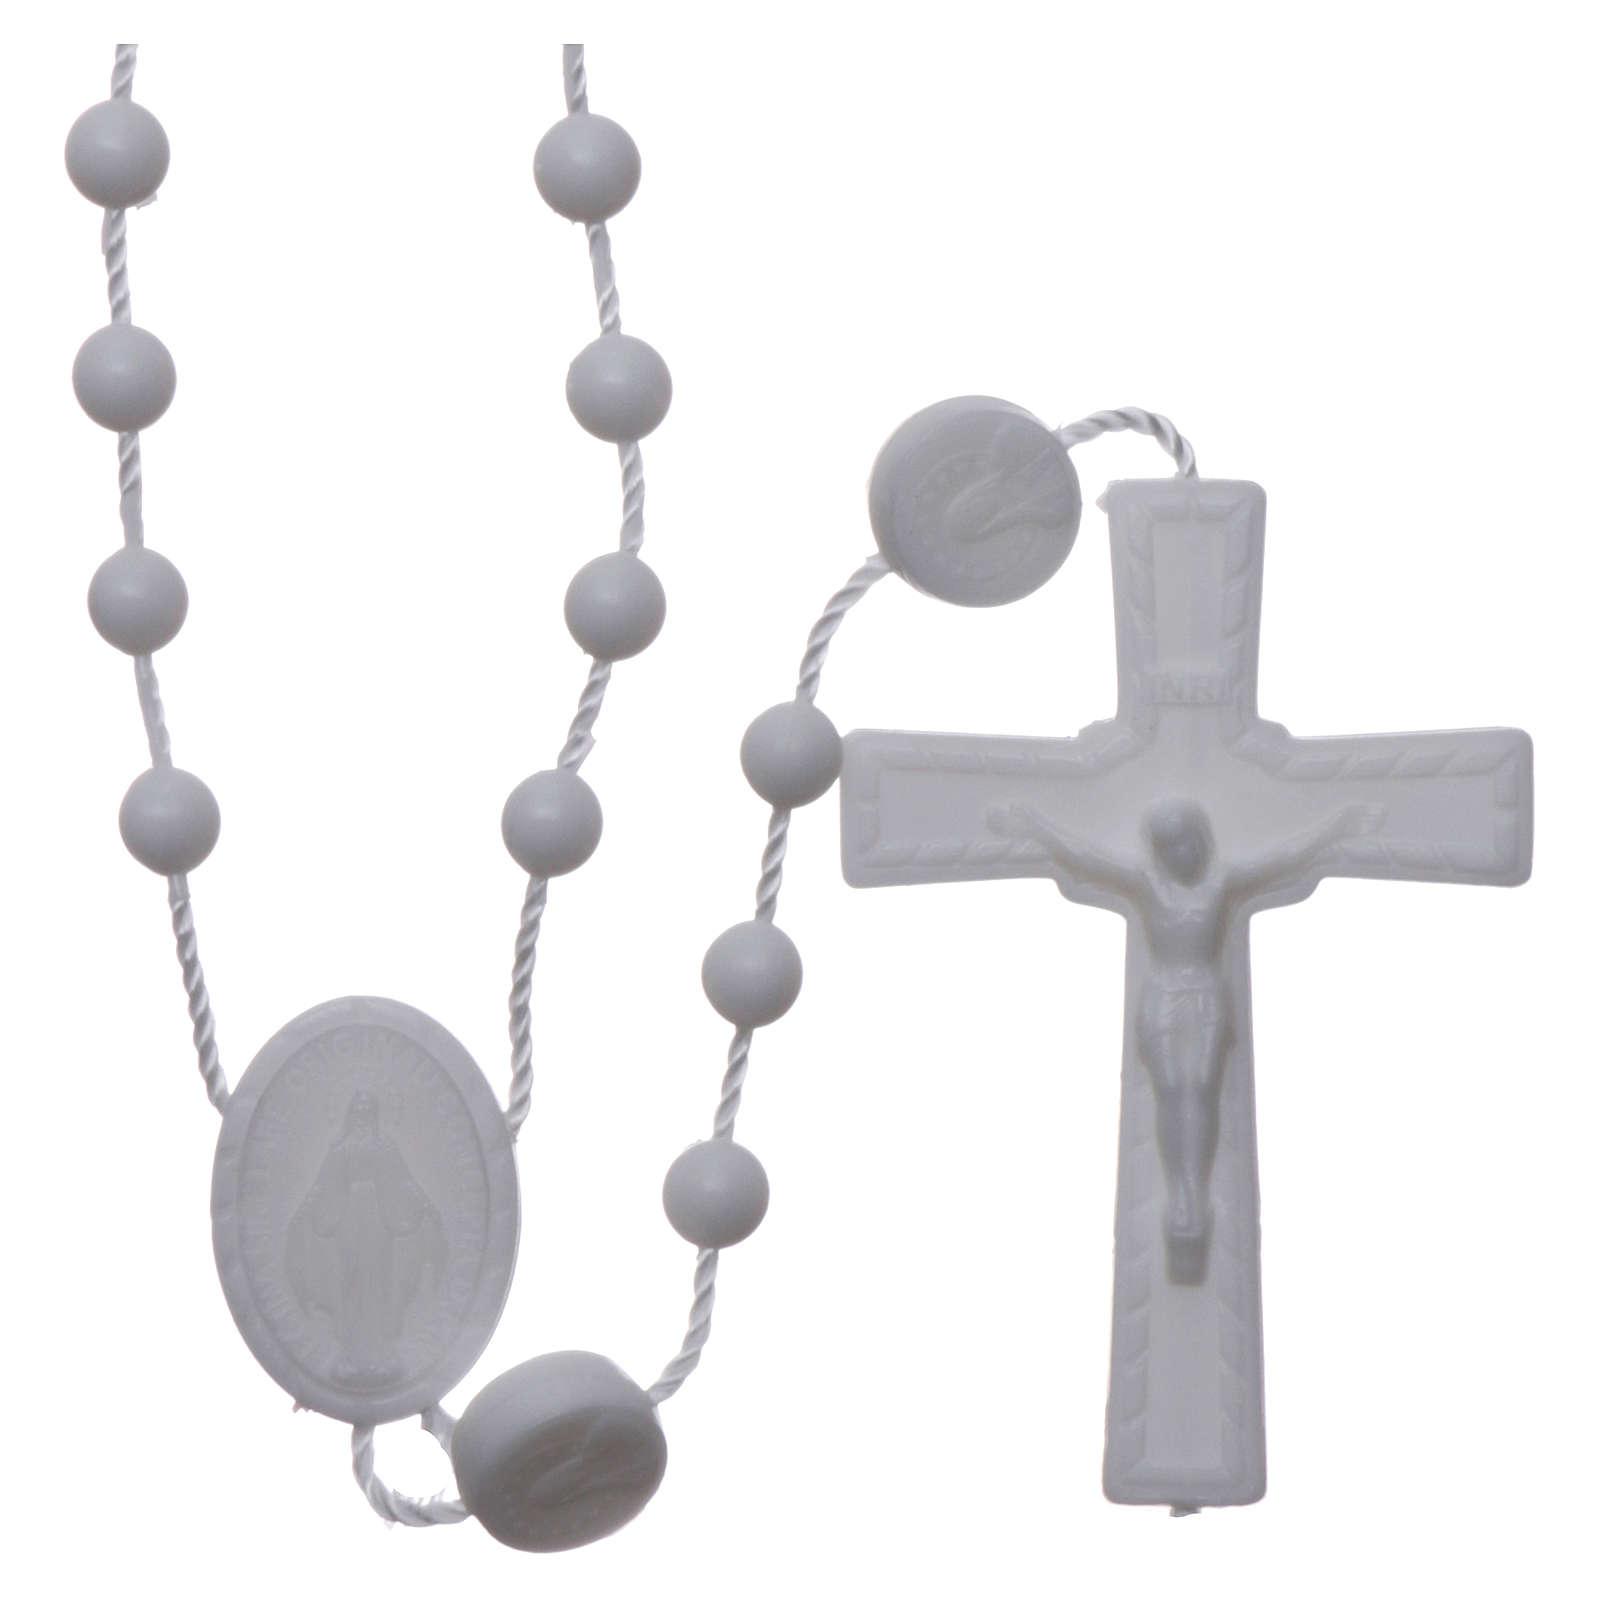 Chapelet blanc nylon Vierge Miraculeuse 4